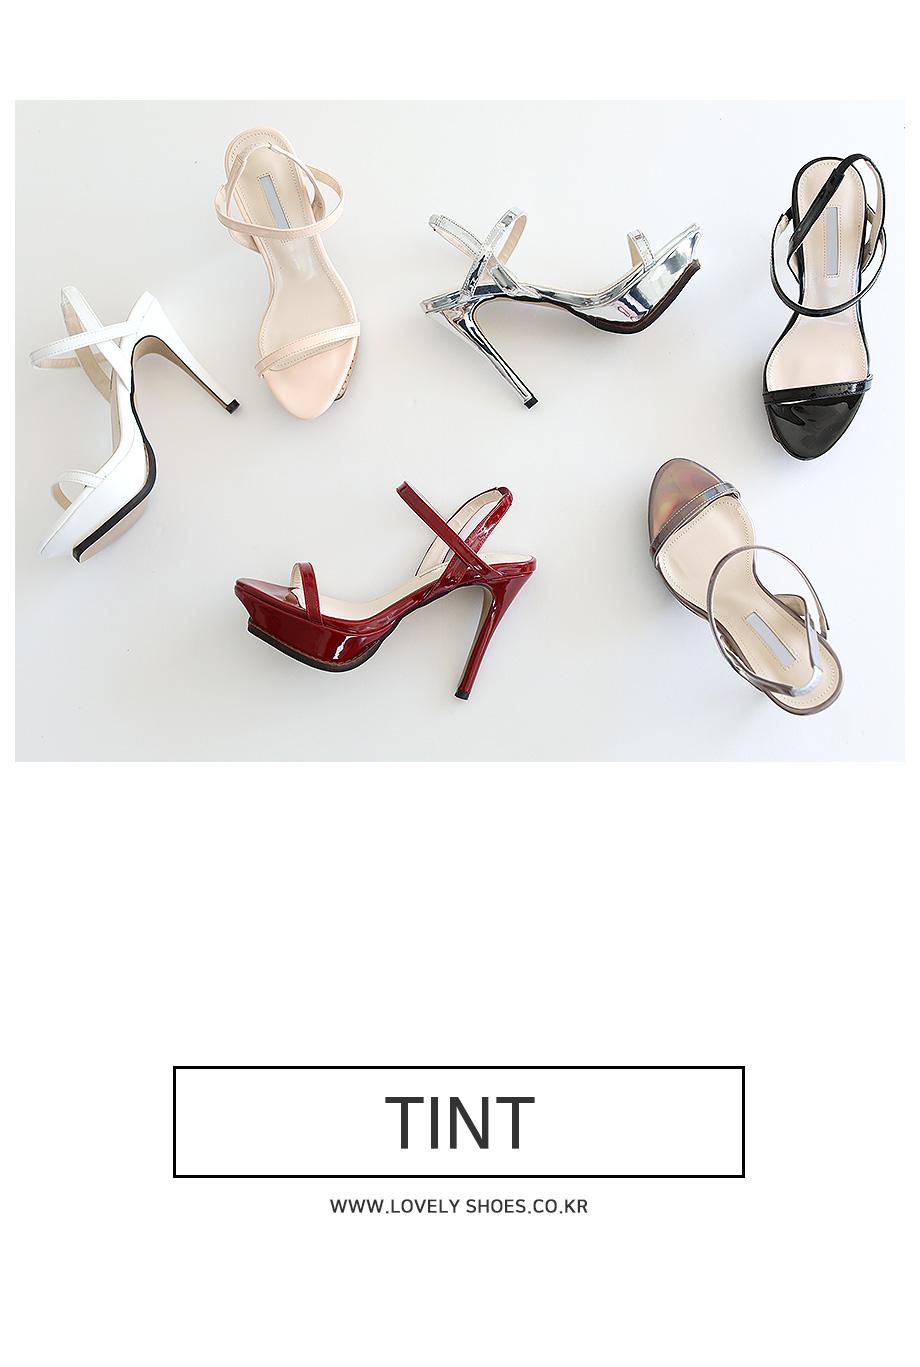 Tin Strap Slingback Heel 11.5cm